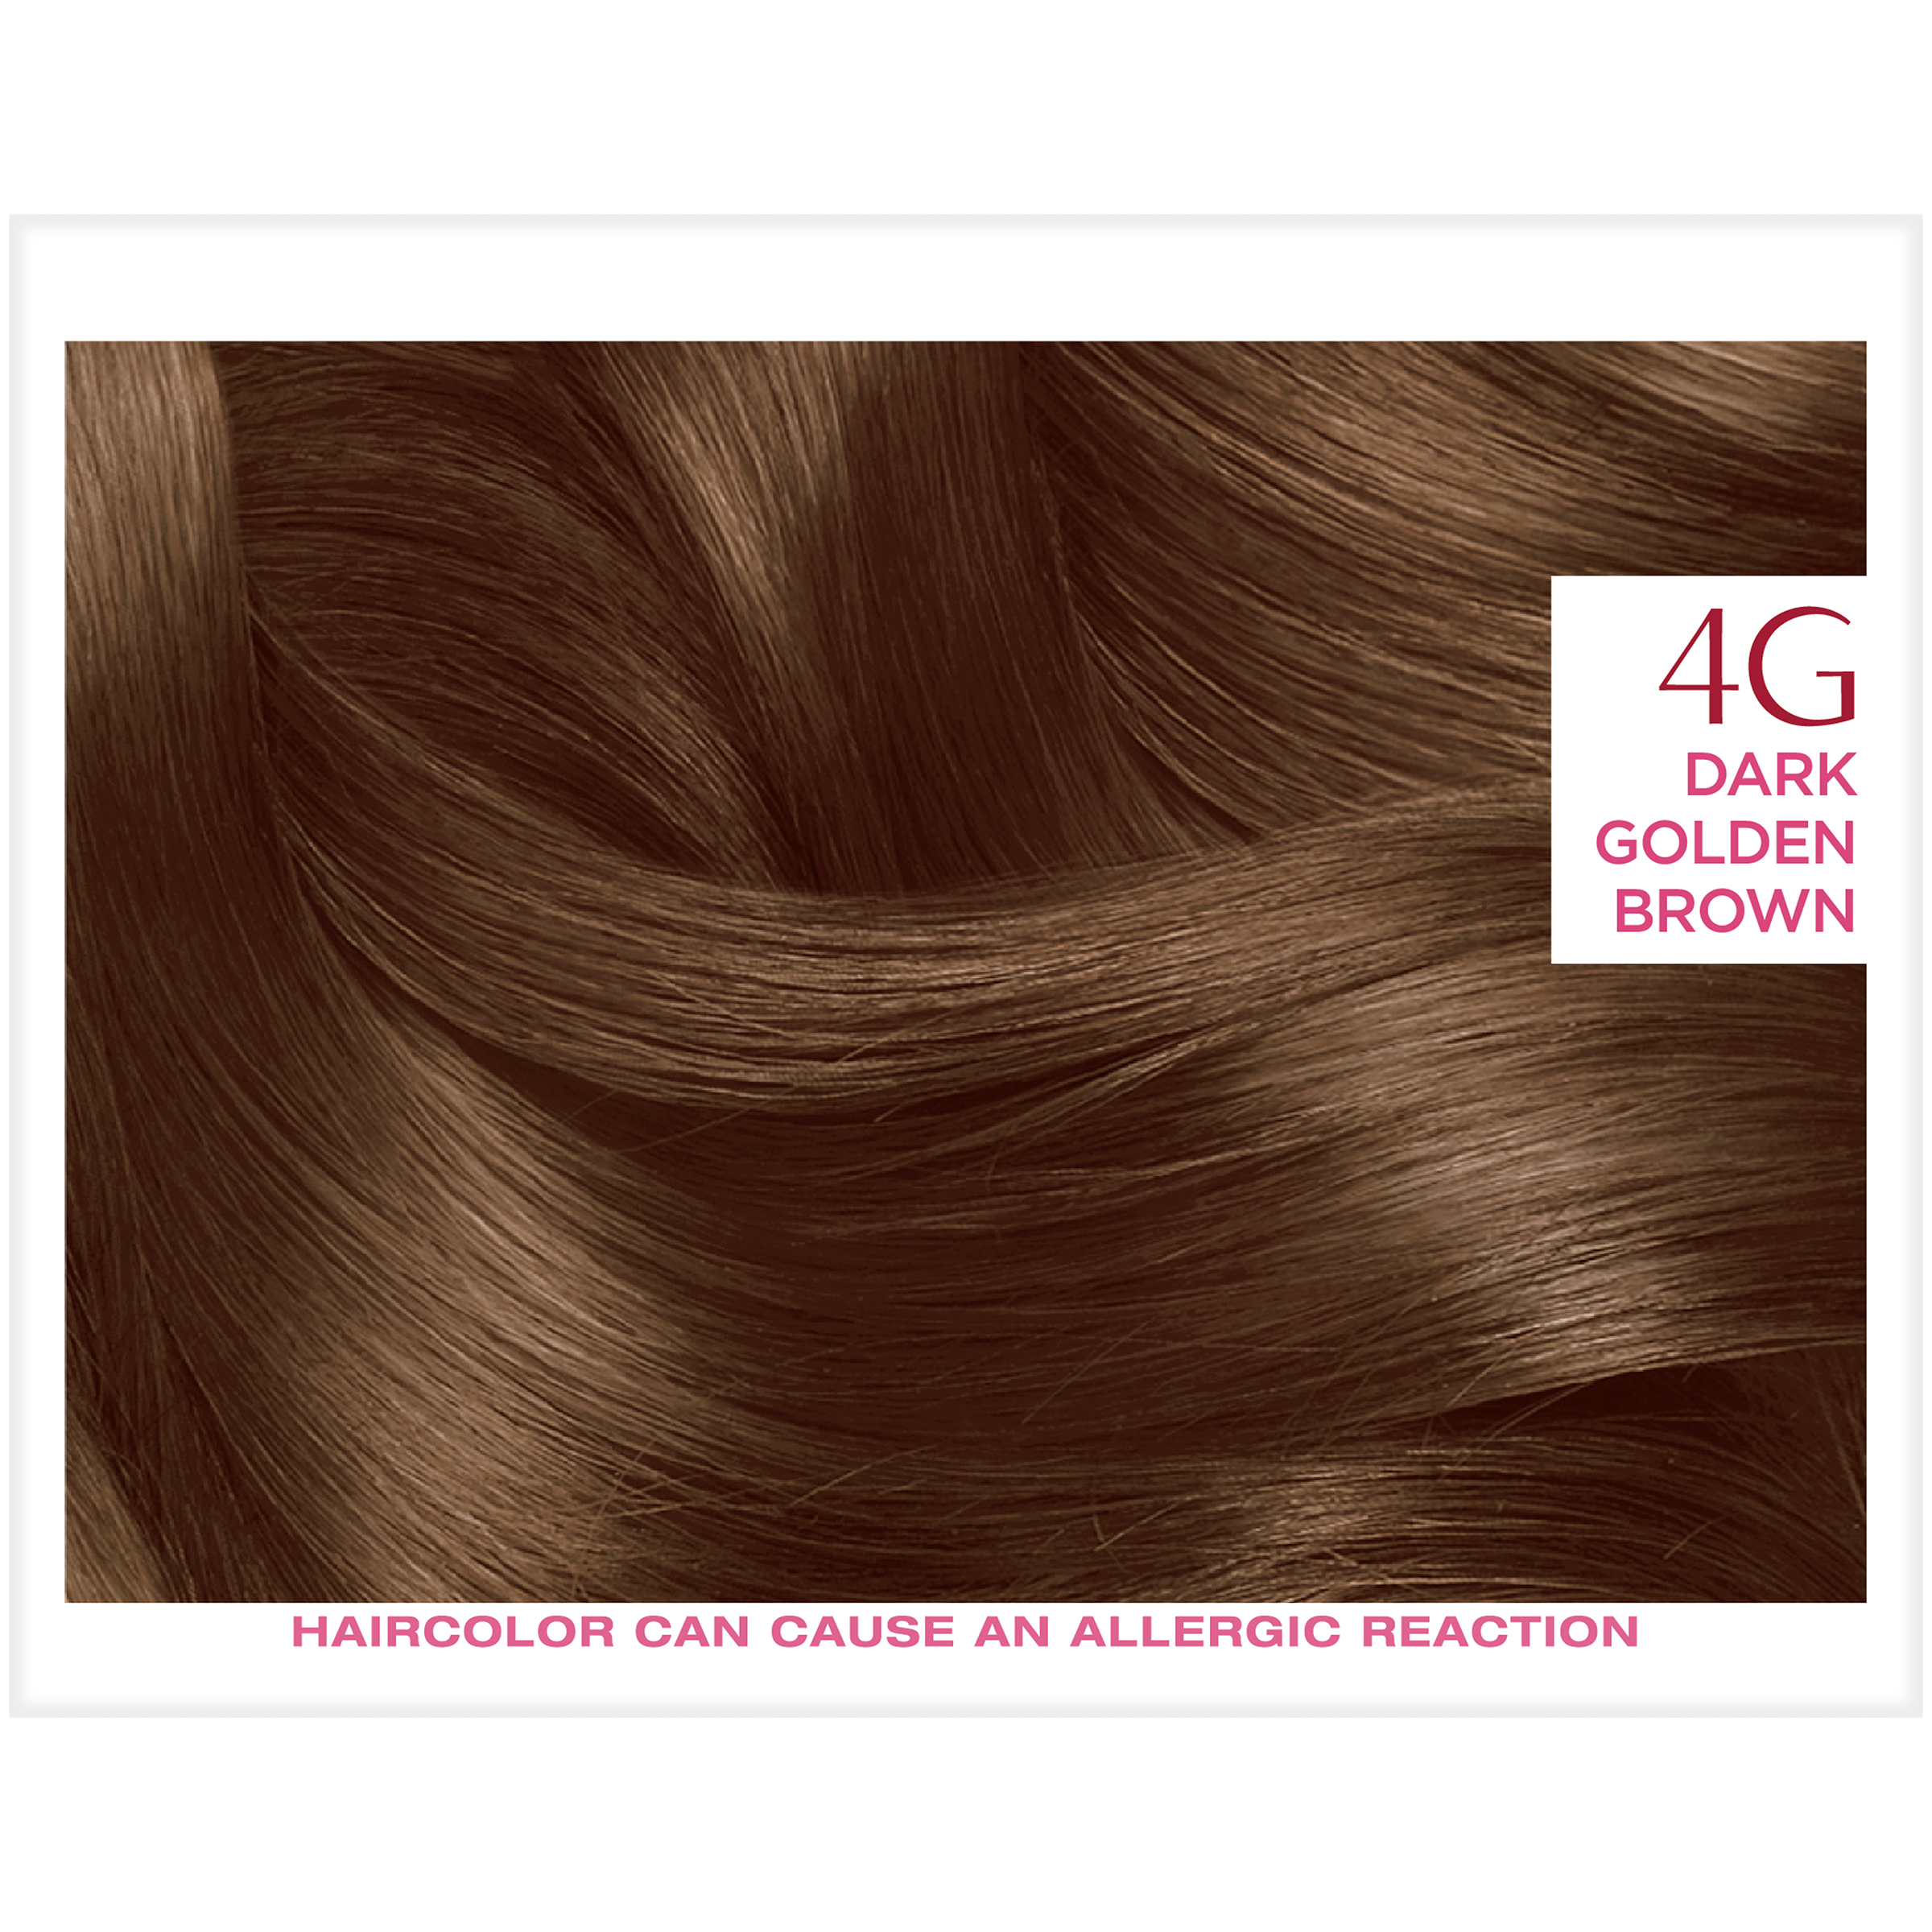 Loreal Excellence Creme 4g Dark Golden Brown Warmer Hair Color Dye